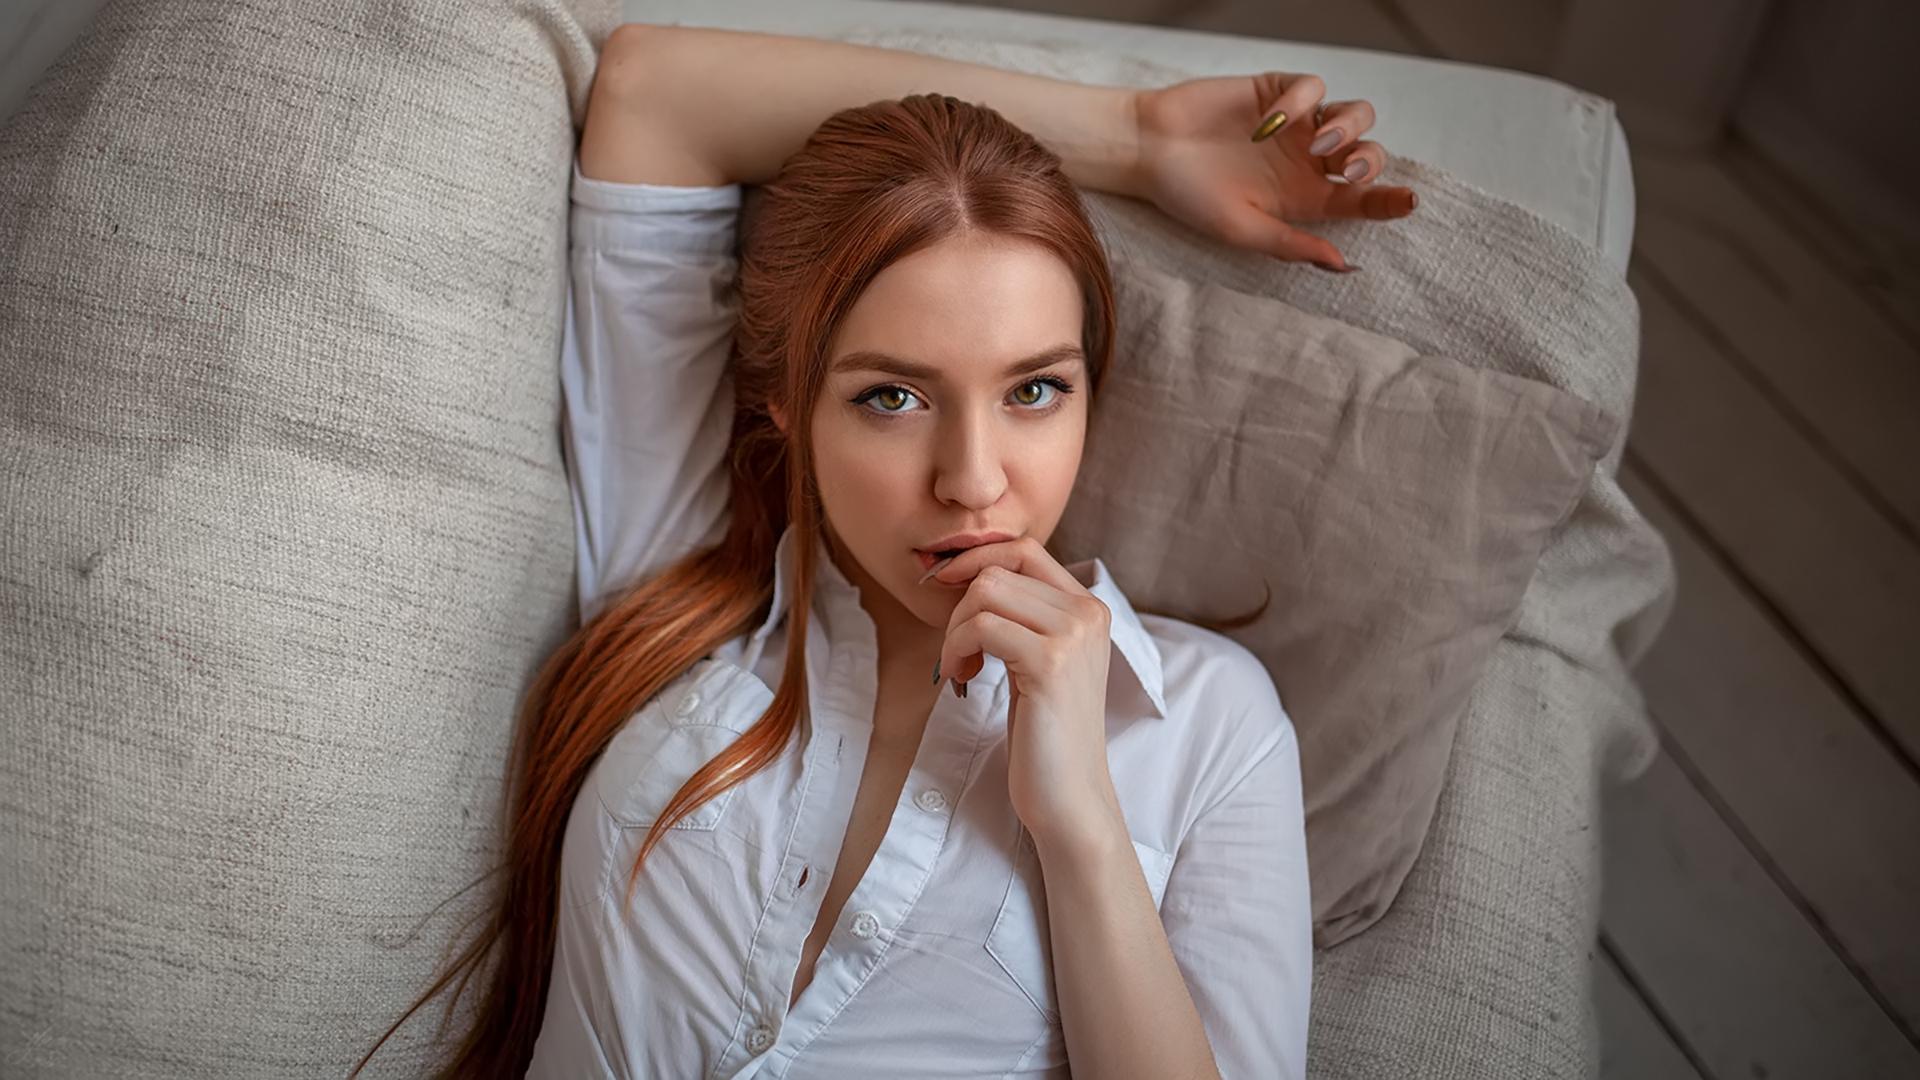 Wallpaper : Women, Face, Portrait, Redhead, White Shirt